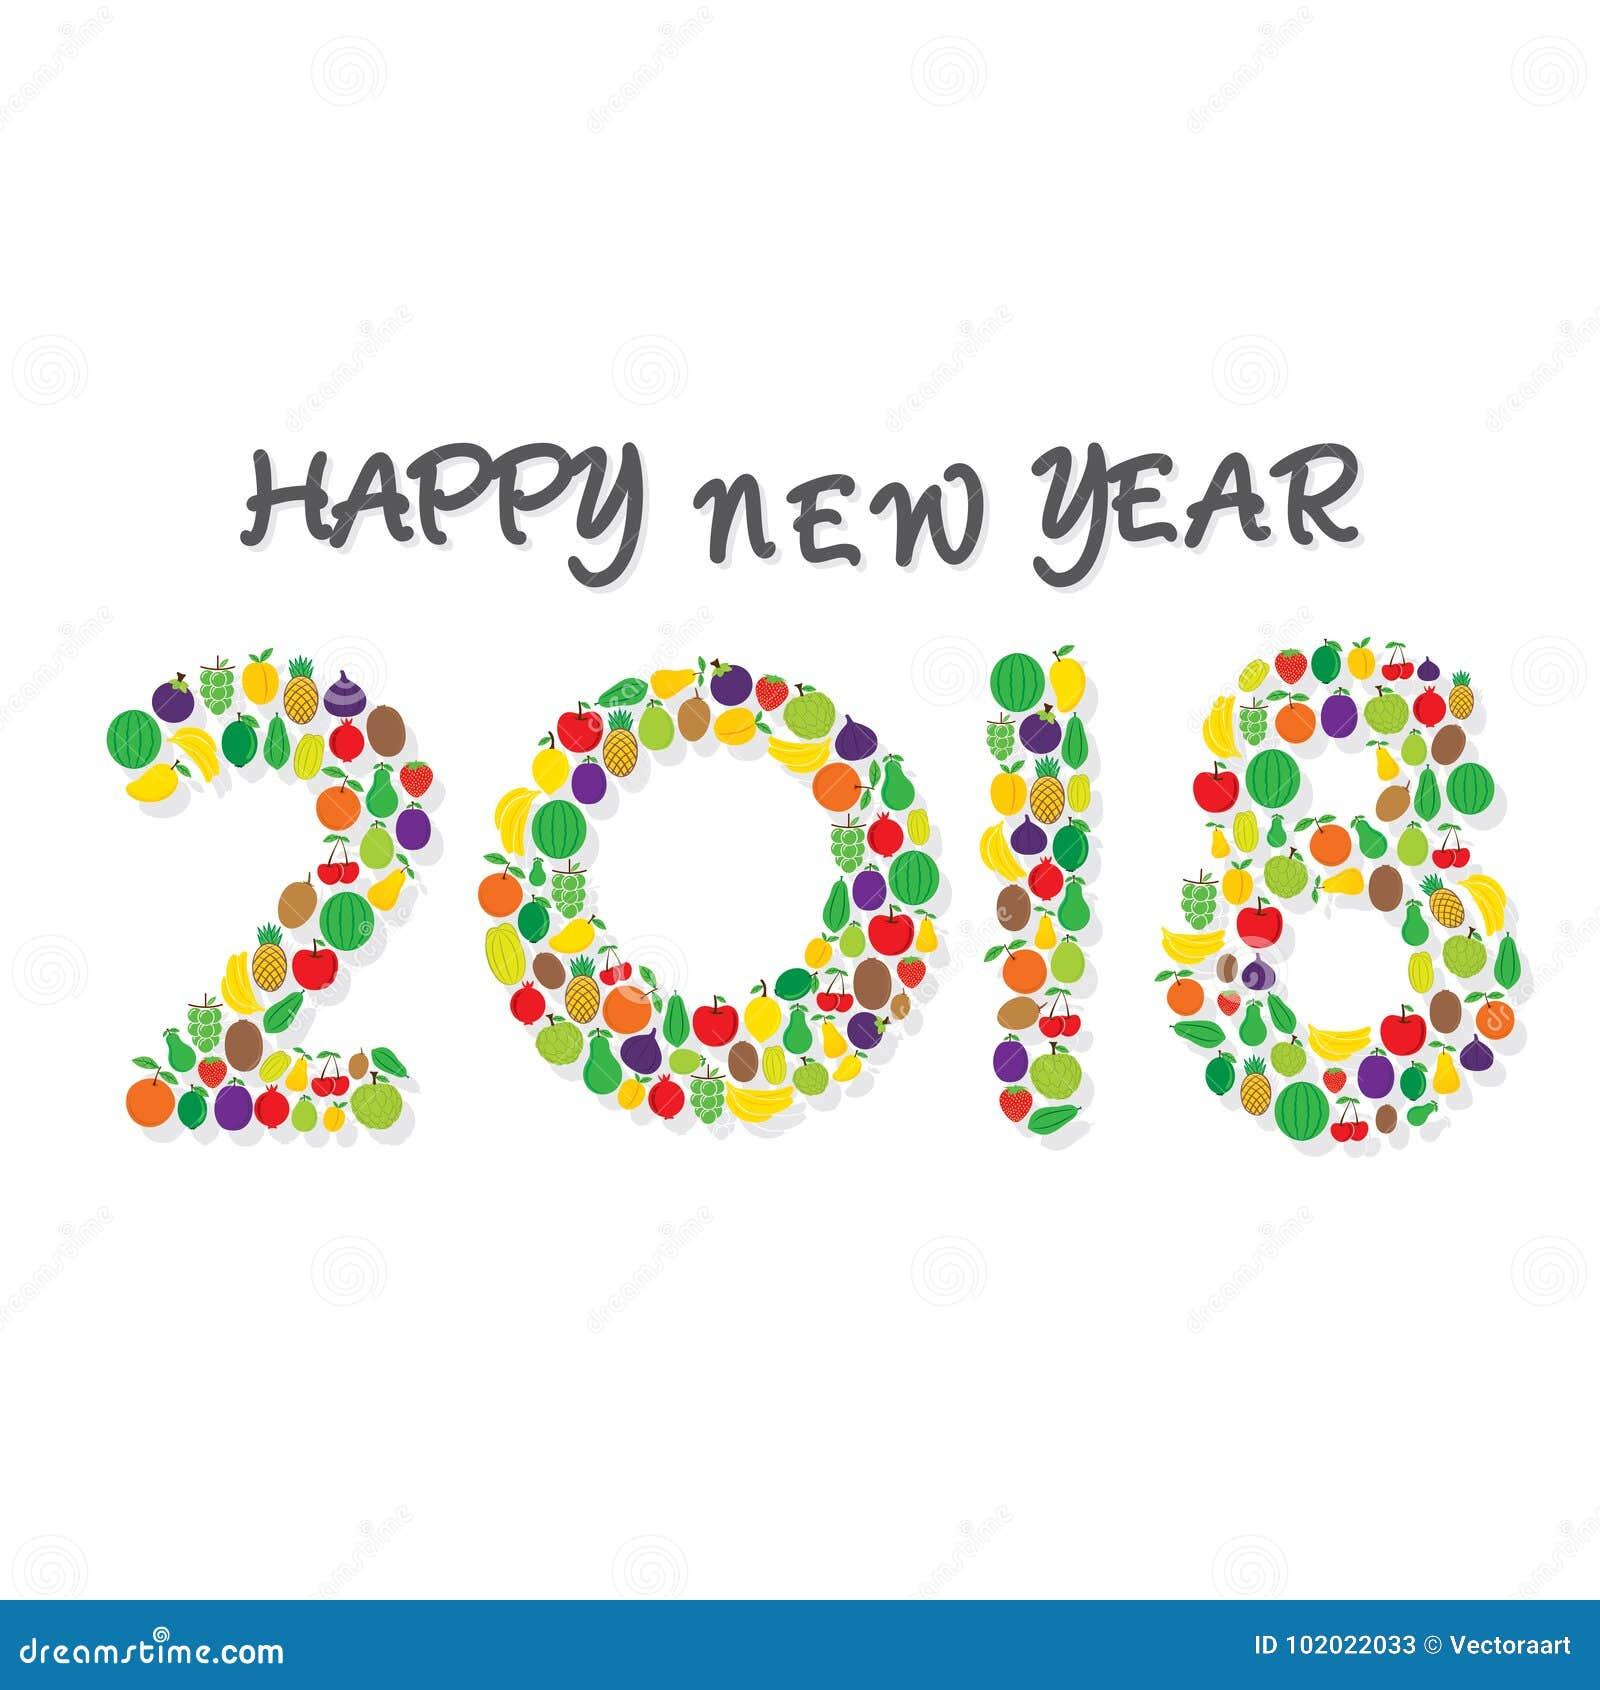 Creative Happy New Year 2018 Poster Design Using Brush Stock Vector ...